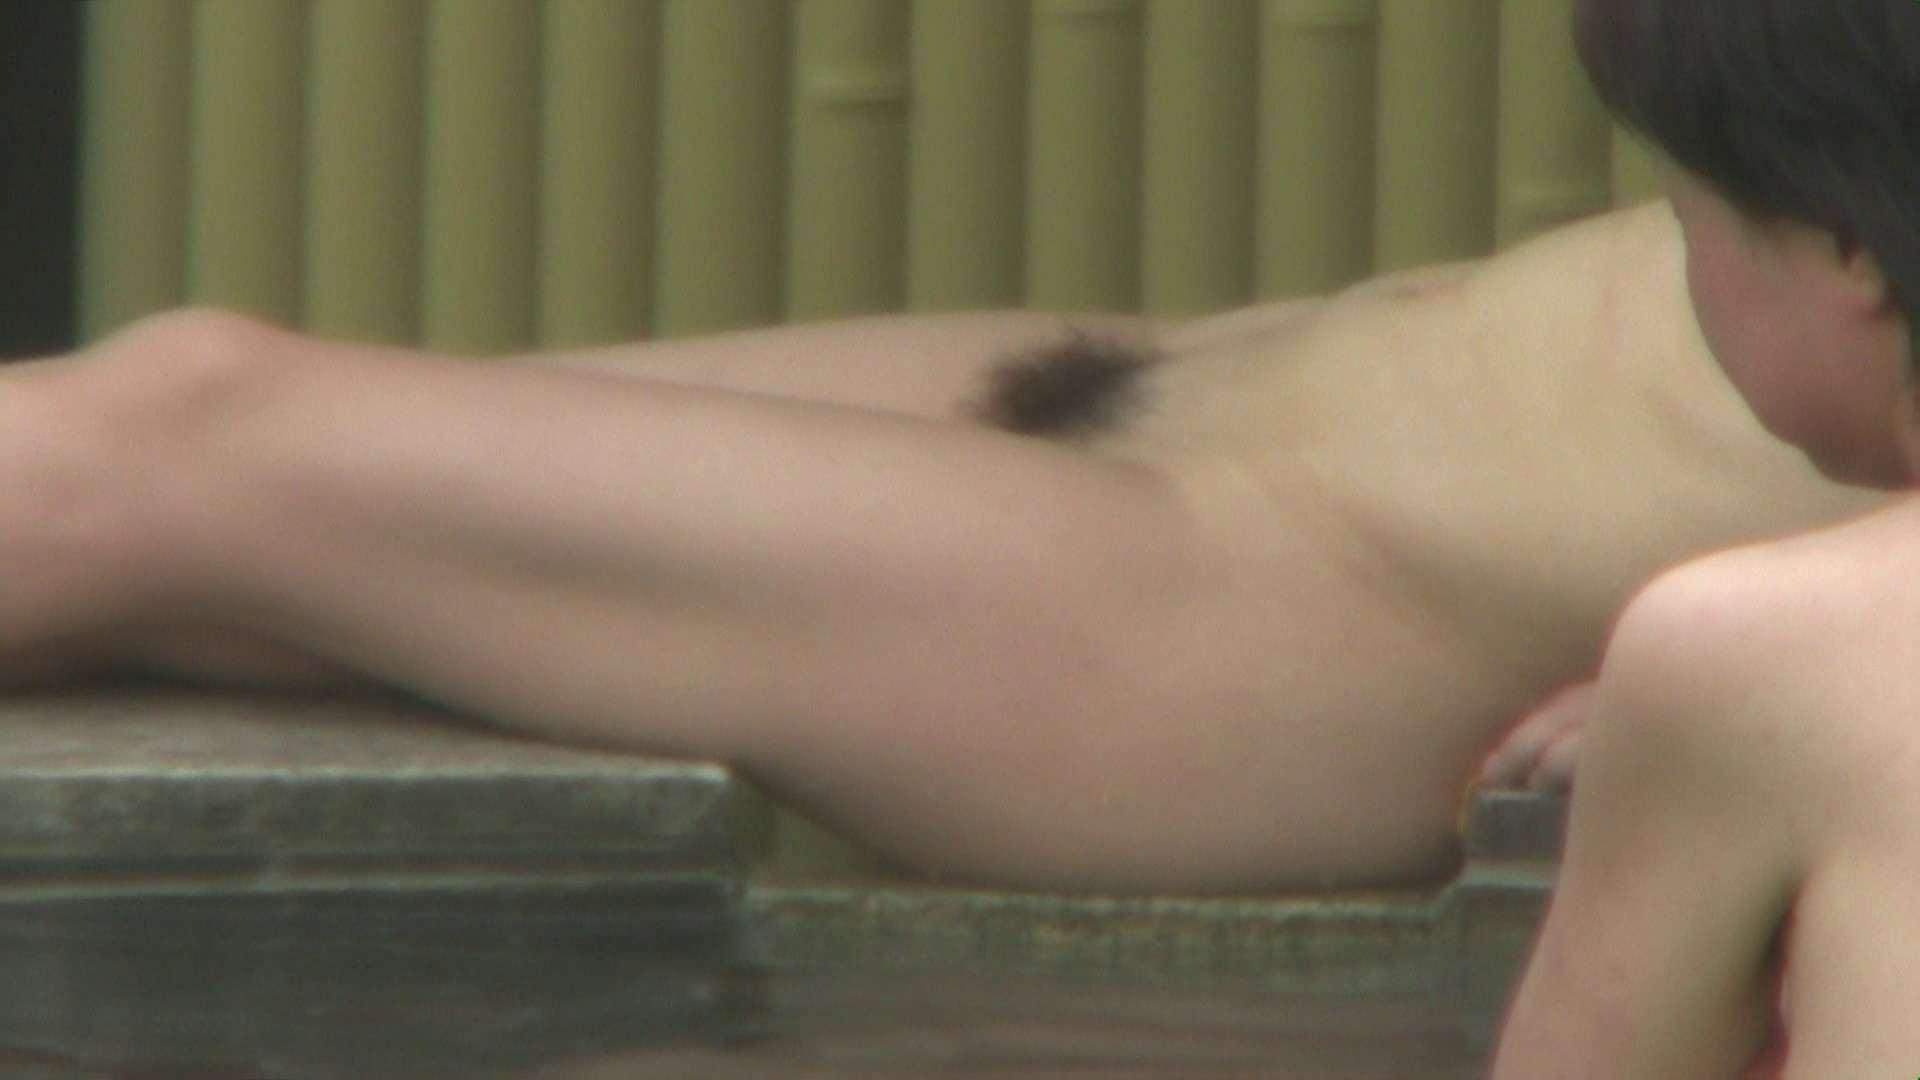 Aquaな露天風呂Vol.74【VIP限定】 露天風呂編  103PIX 6